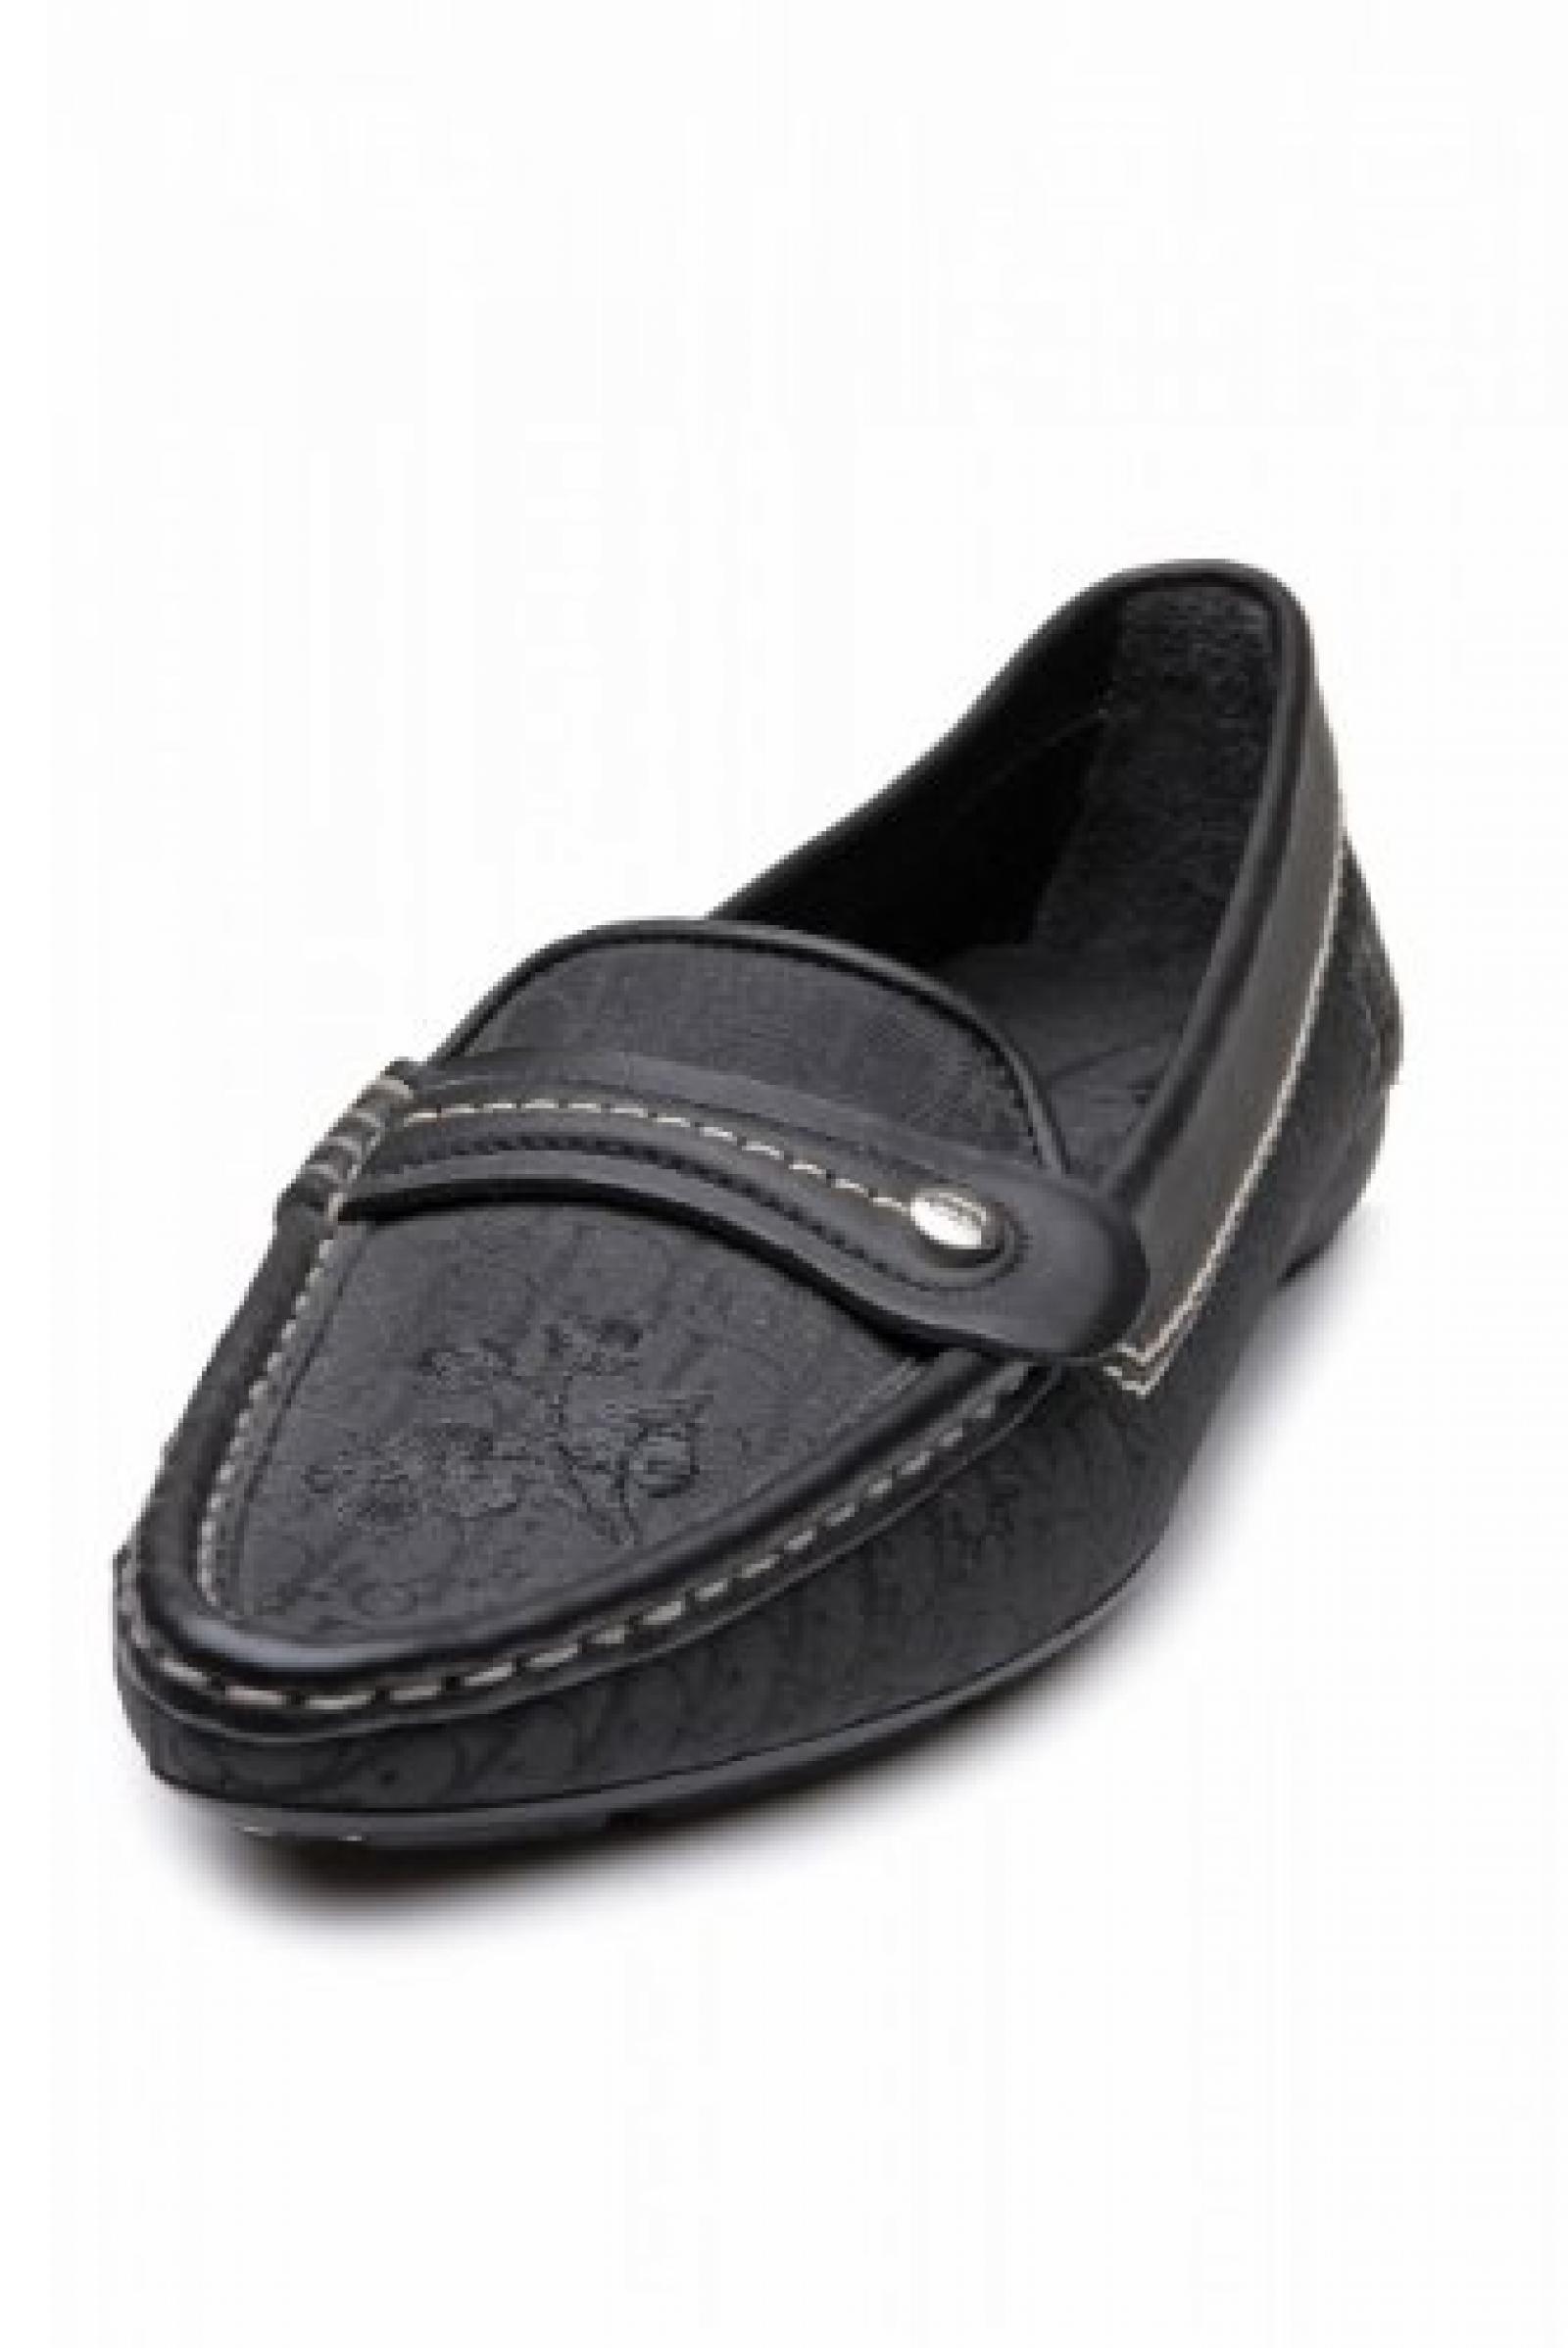 Dior Damen Schuhe Damen Loafer LORENA, Farbe: Schwarz